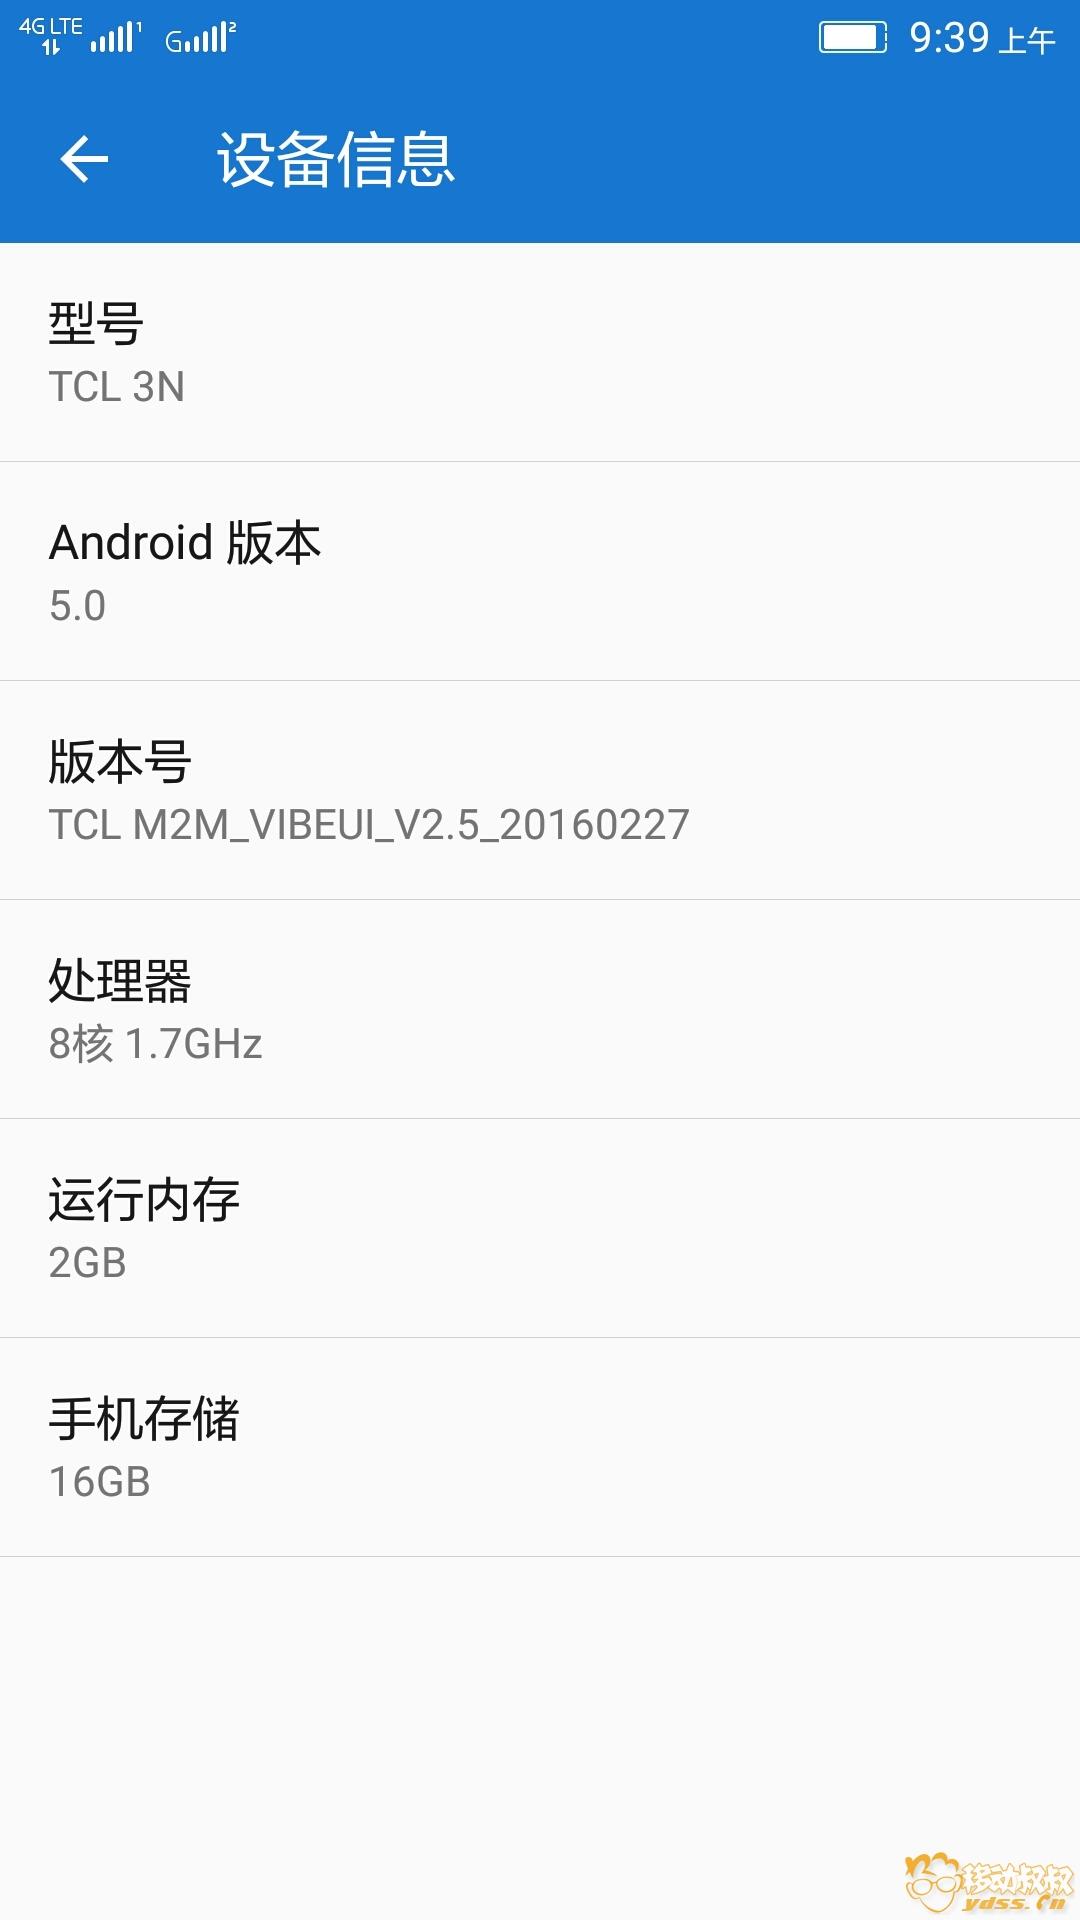 Screenshot_2016-02-27-09-39-17-959.jpeg